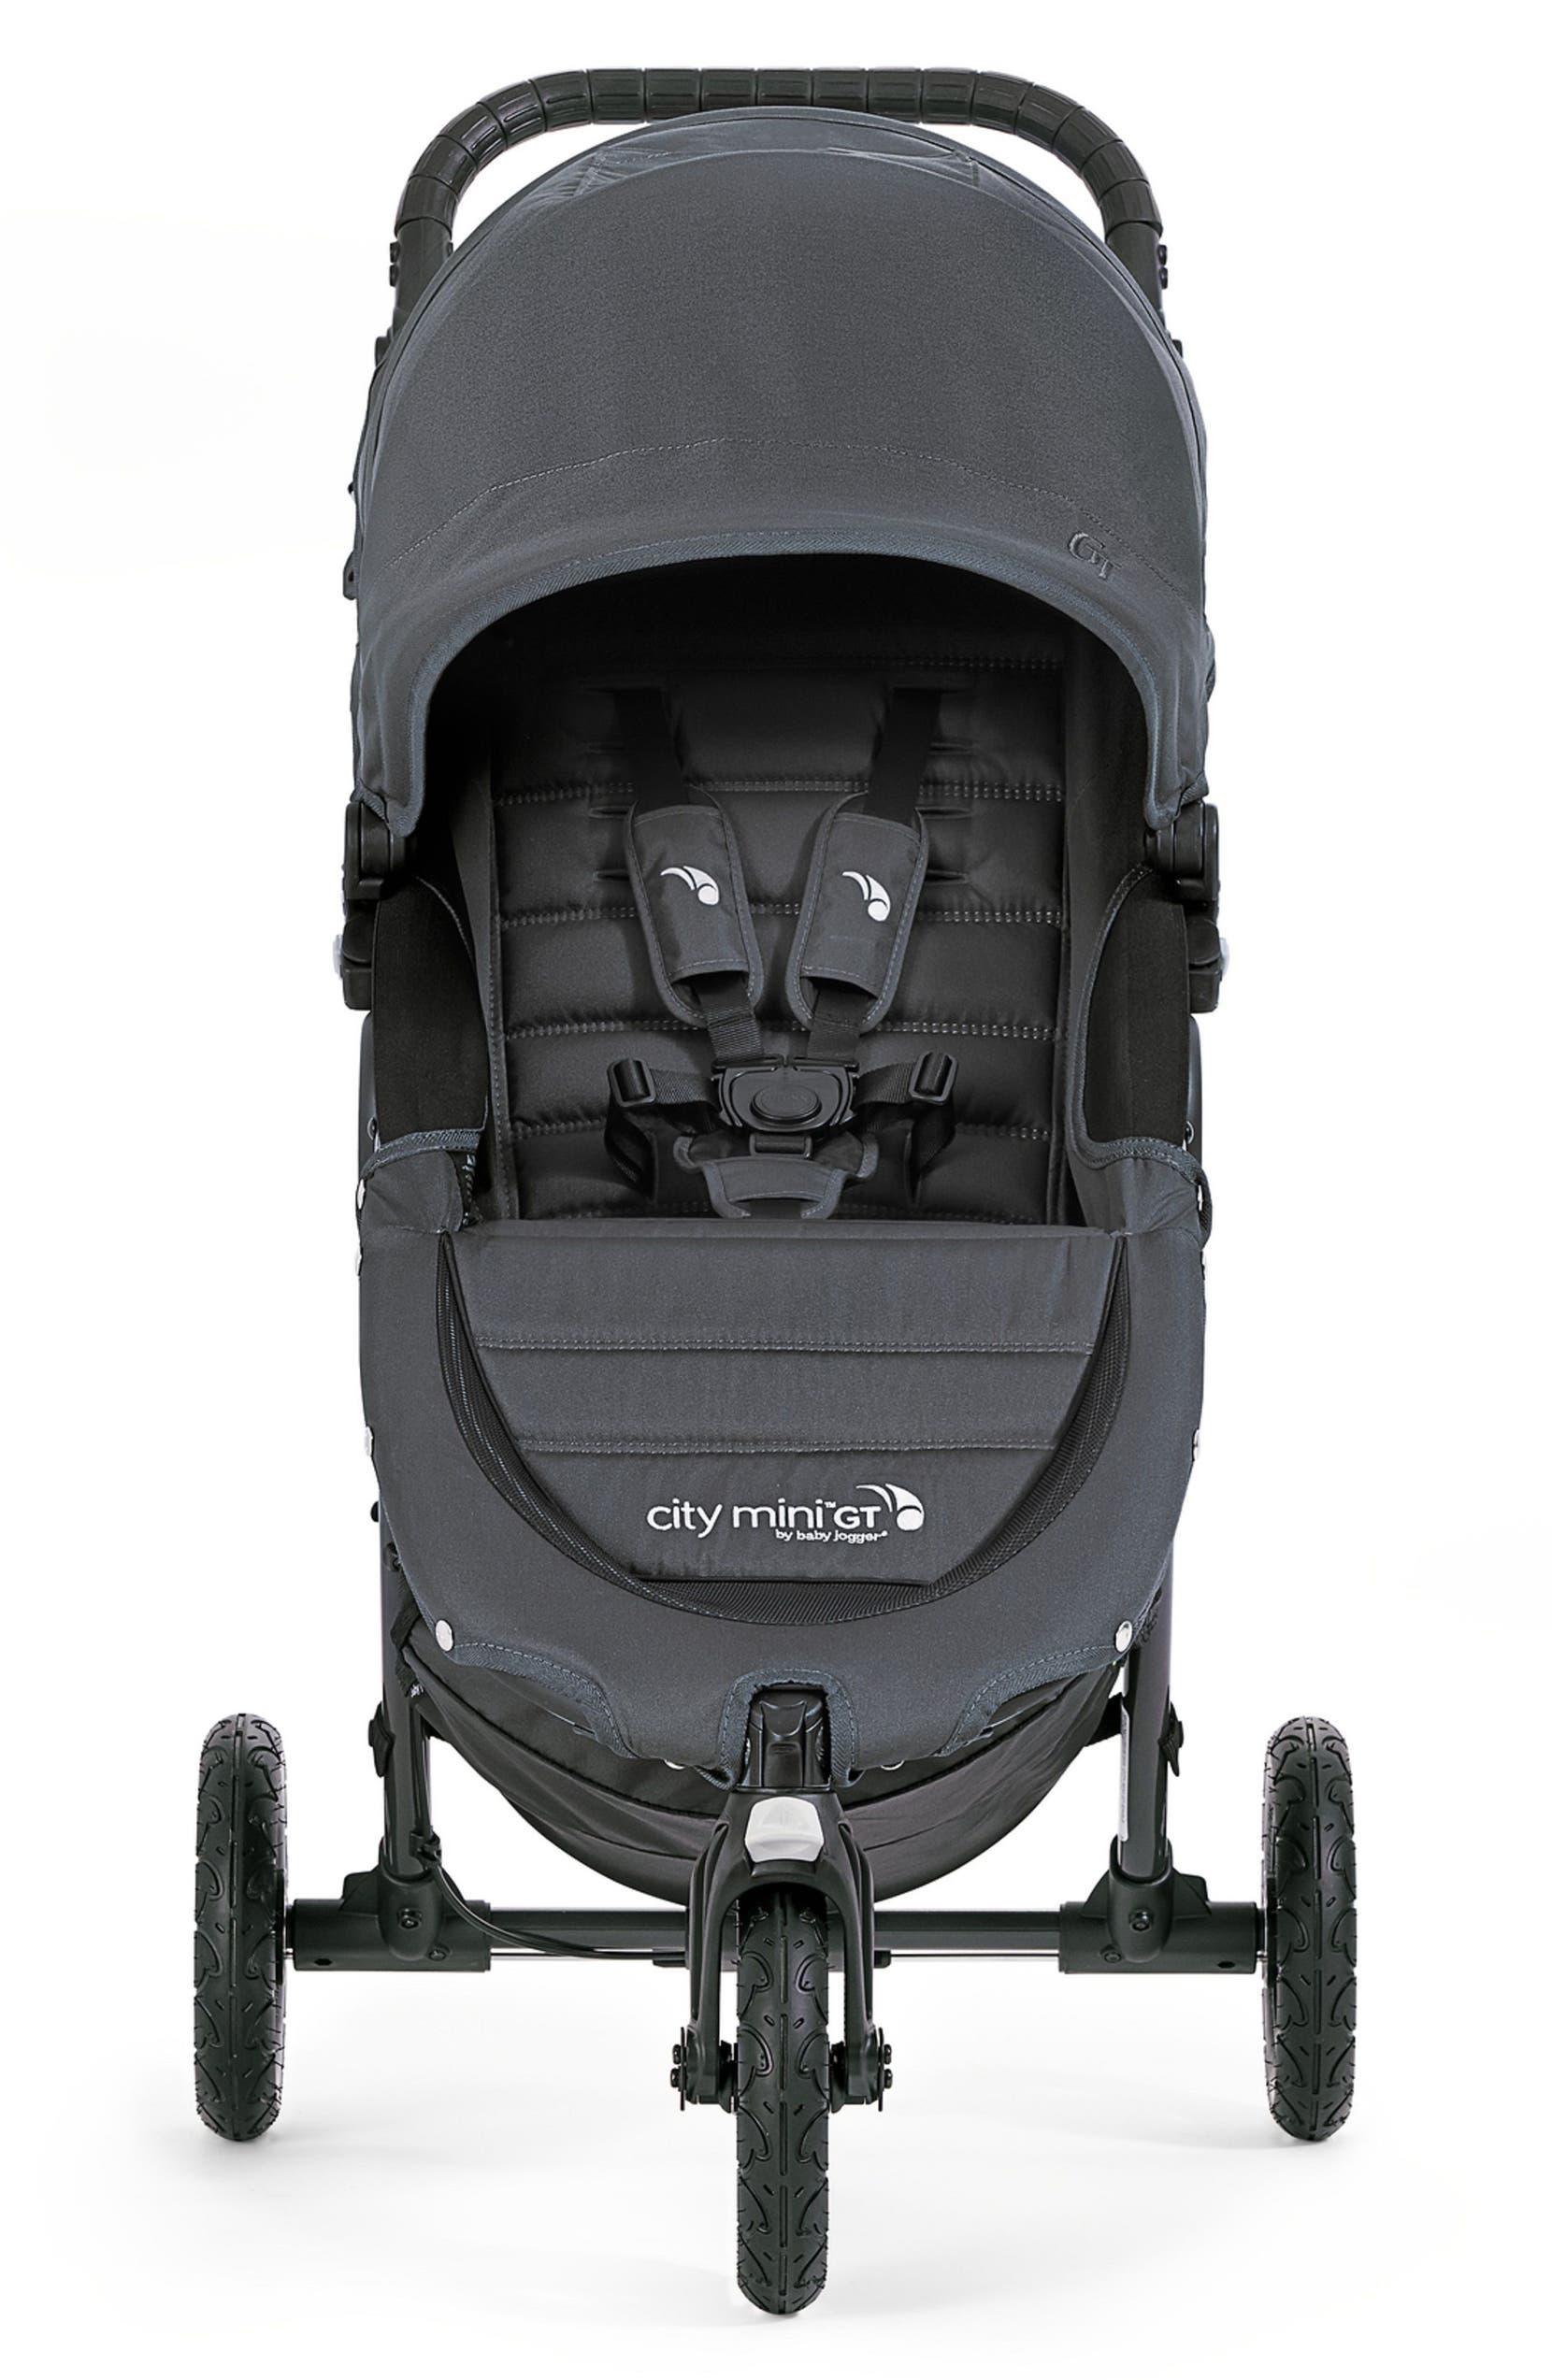 City Mini® GT Stroller